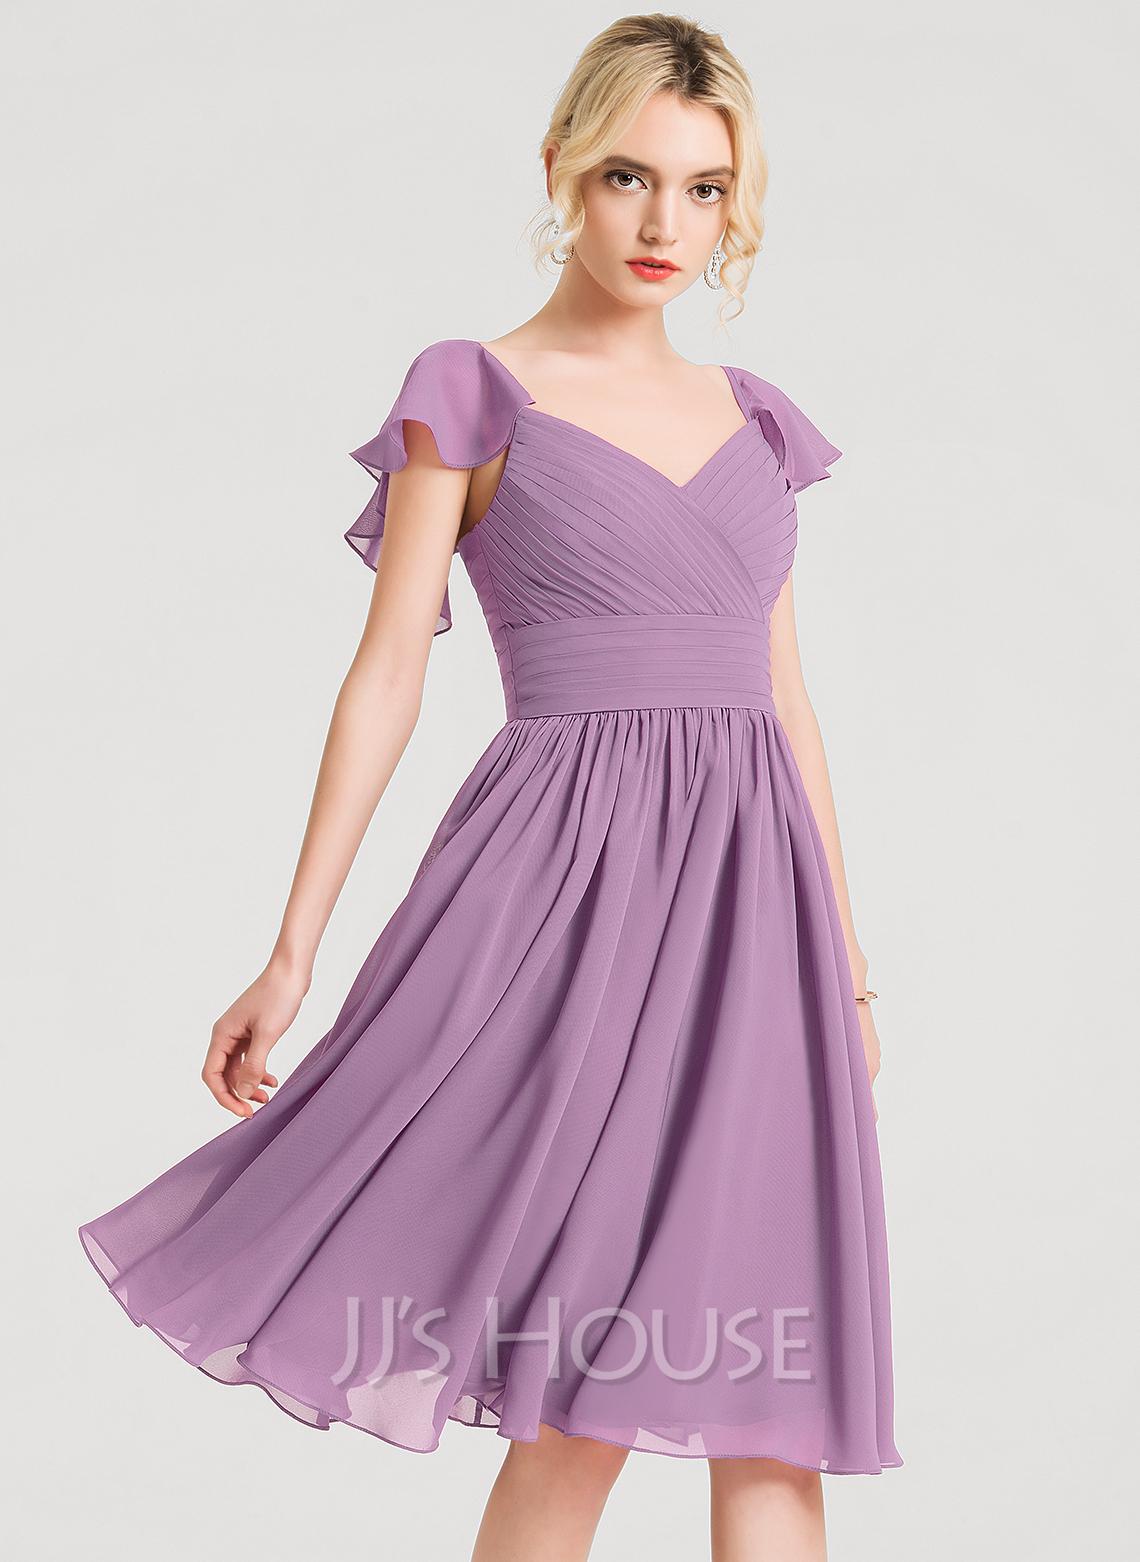 A-Line/Princess V-neck Knee-Length Chiffon Cocktail Dress With Ruffle